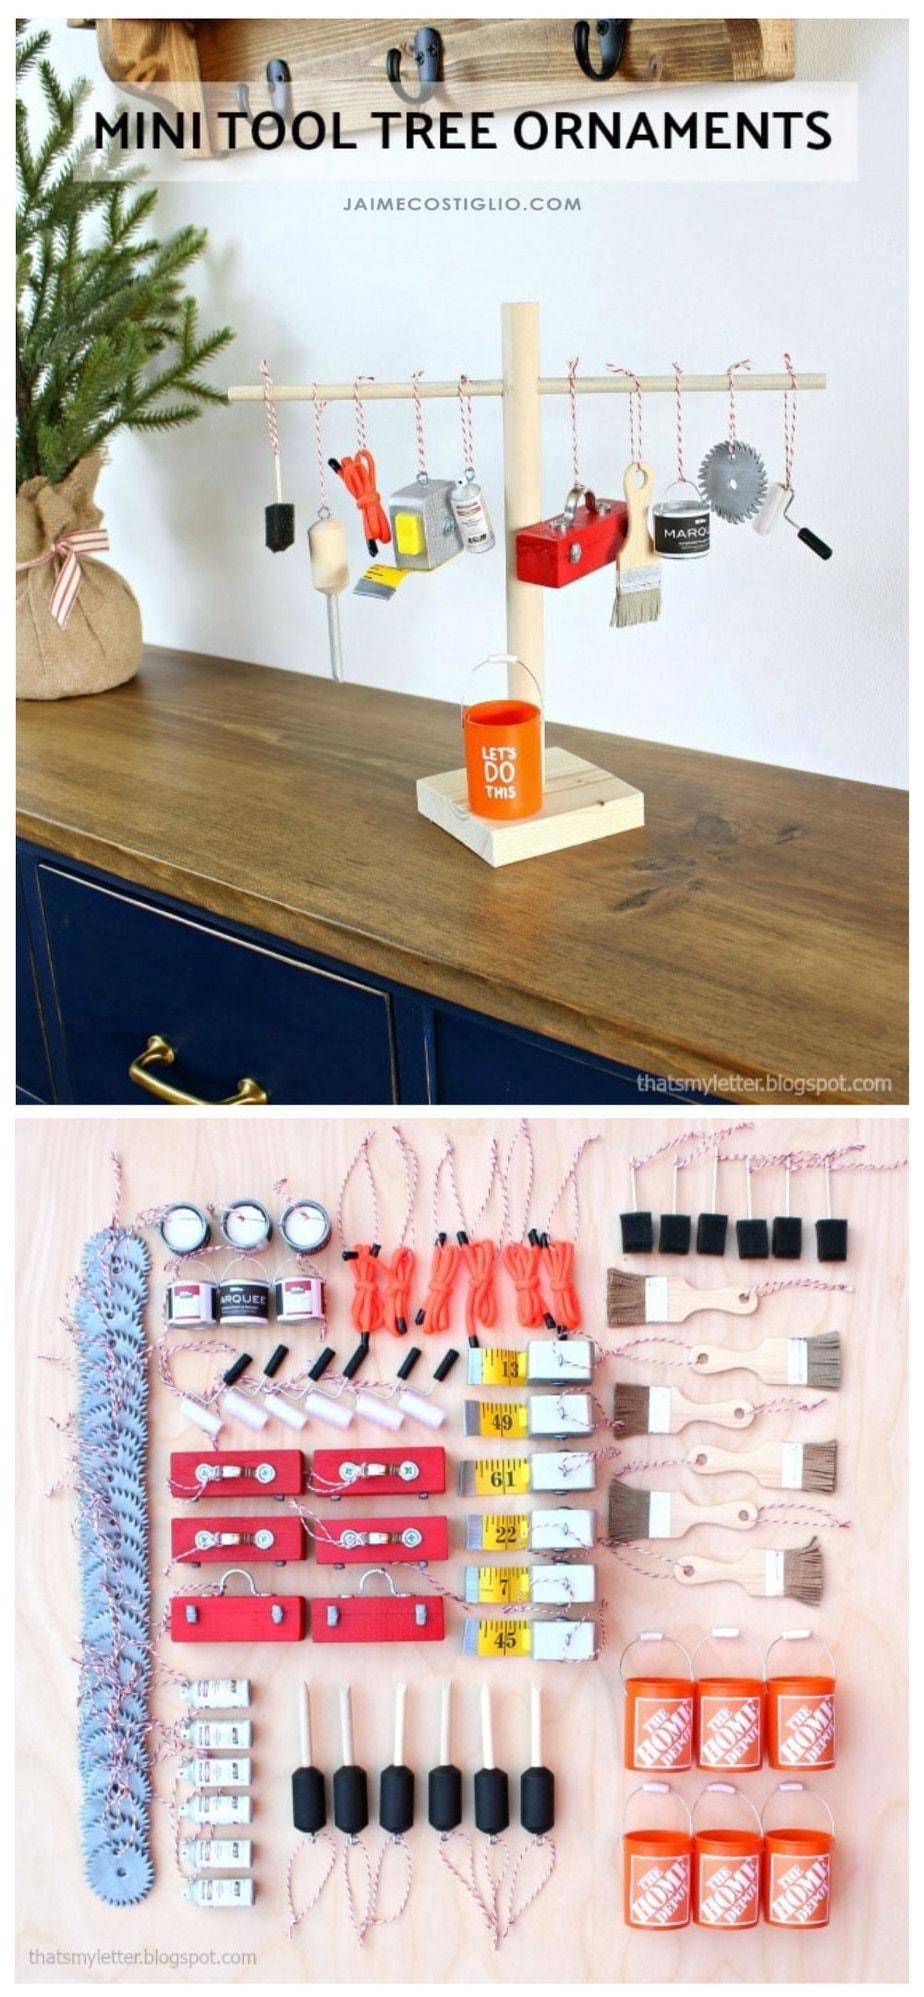 diy mini tool ornaments free plans